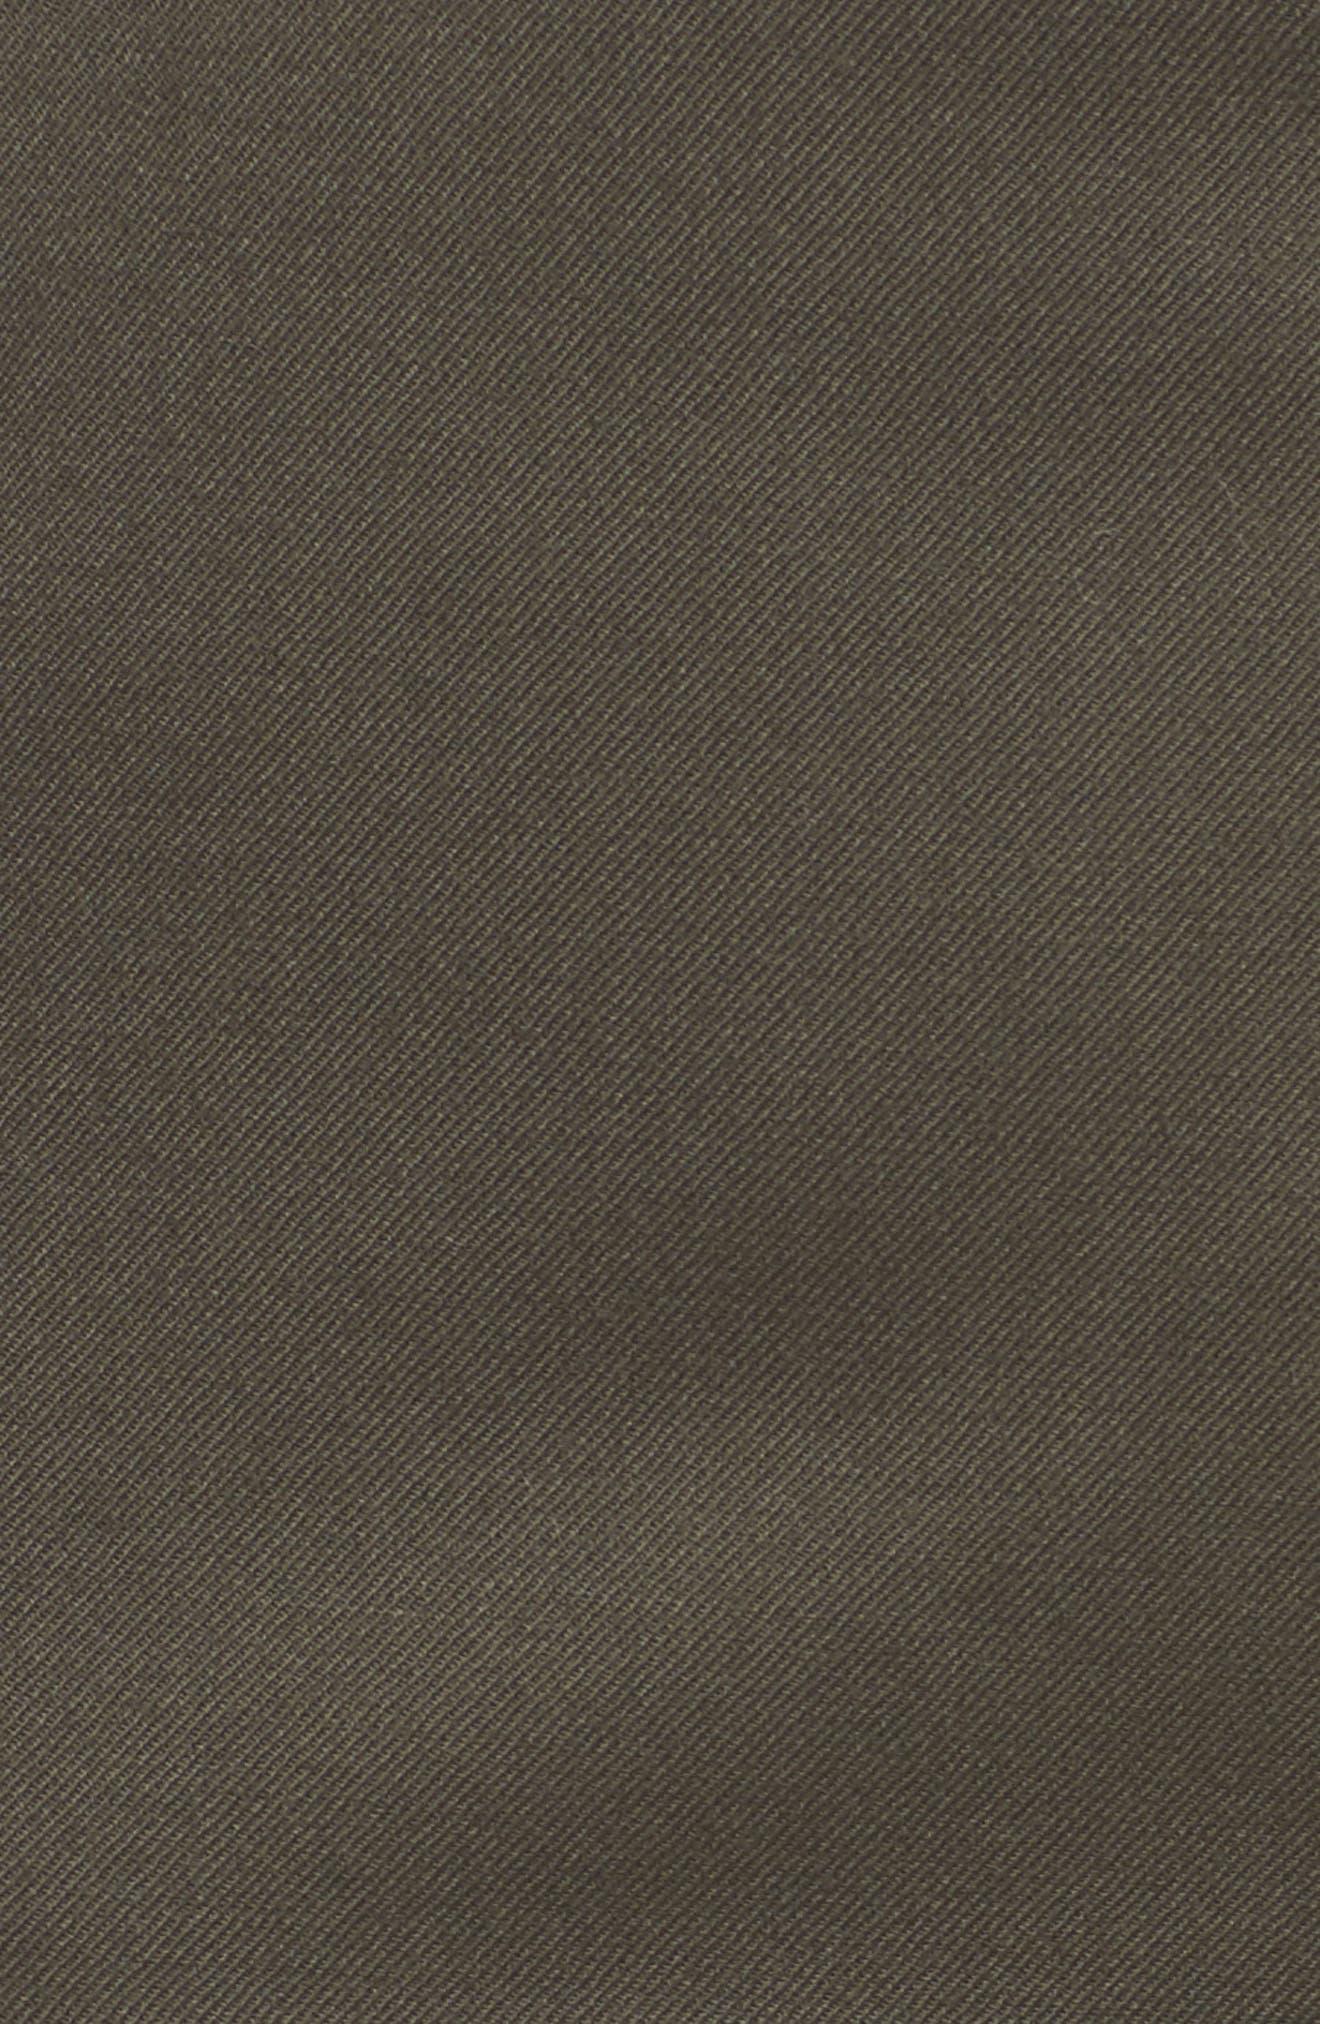 Wide Leg Stretch Wool Pants,                             Alternate thumbnail 5, color,                             311